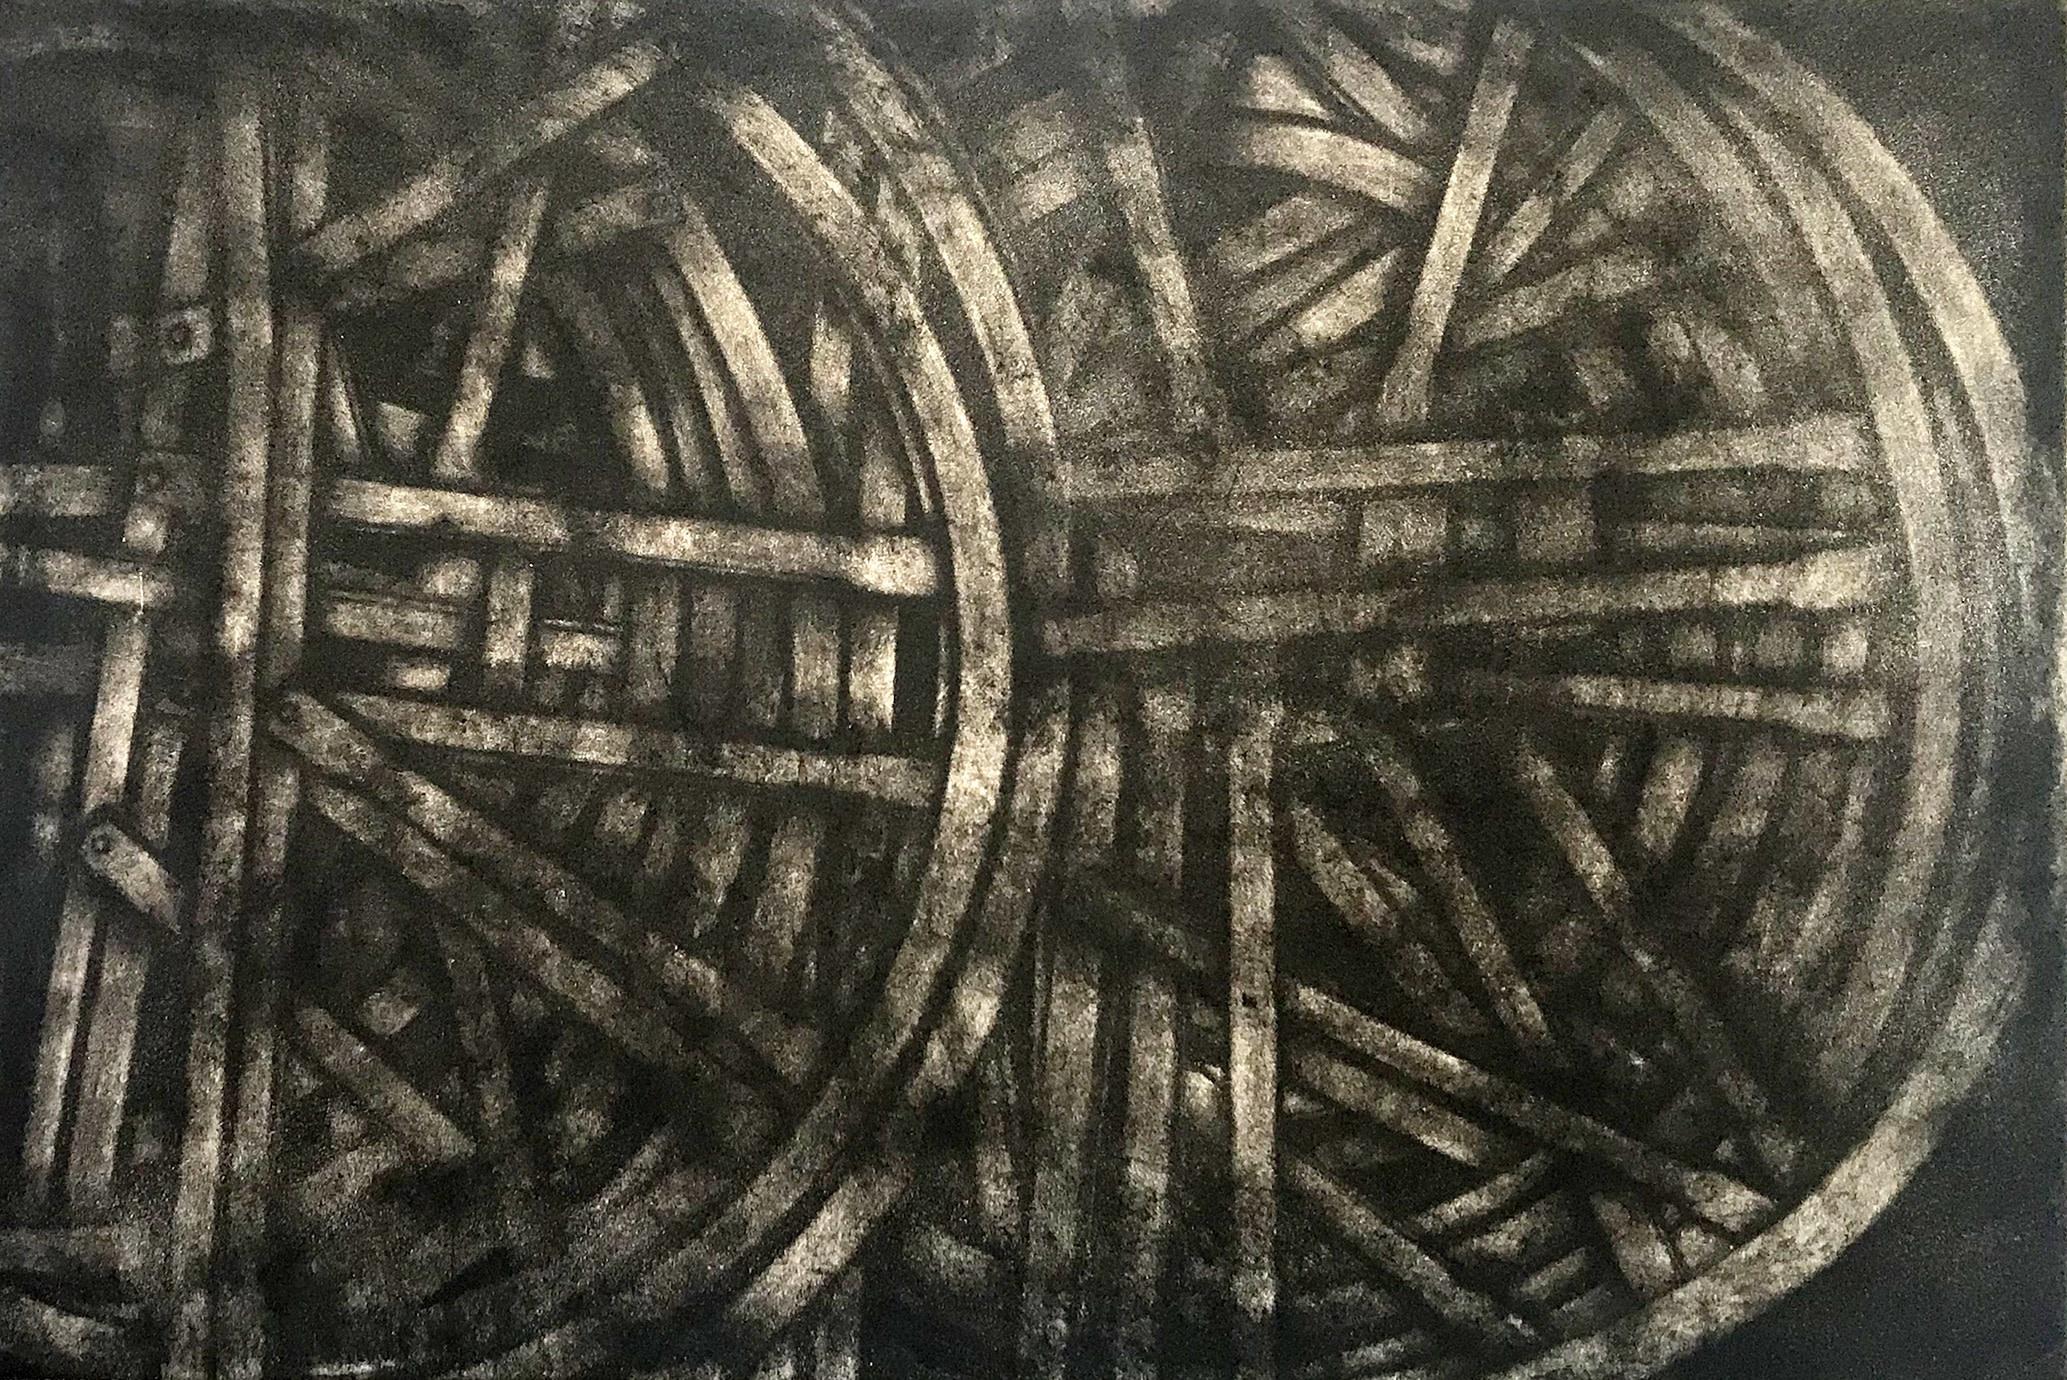 "<span class=""link fancybox-details-link""><a href=""/exhibitions/23/works/artworks_standalone11318/"">View Detail Page</a></span><div class=""artist""><span class=""artist""><strong>Jane Stobart RE</strong></span></div><div class=""title""><em>Whitechapel Bell Wheels</em></div><div class=""medium"">aquatint etching</div><div class=""dimensions"">53 x 74 cm paper size<br>30 x 45 cm image size</div><div class=""edition_details"">edition of 15</div>"